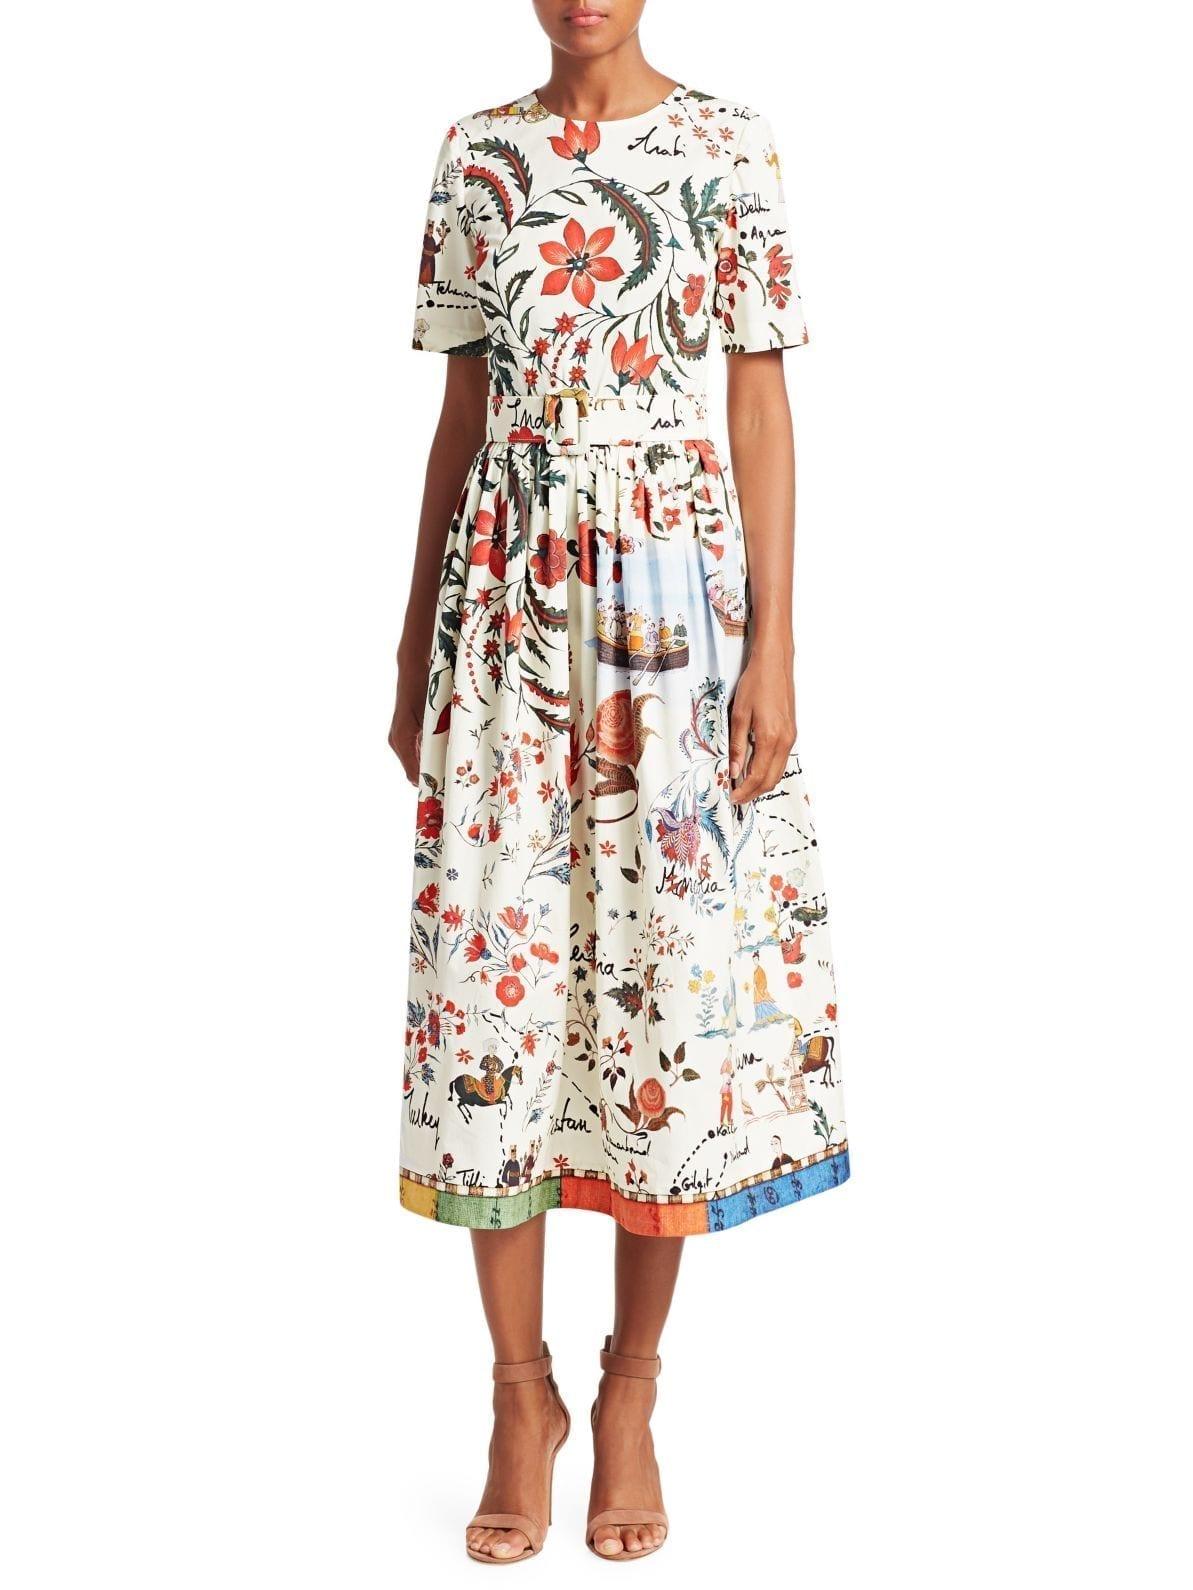 OSCAR DE LA RENTA Belted Midi Flare White / Floral Printed Dress